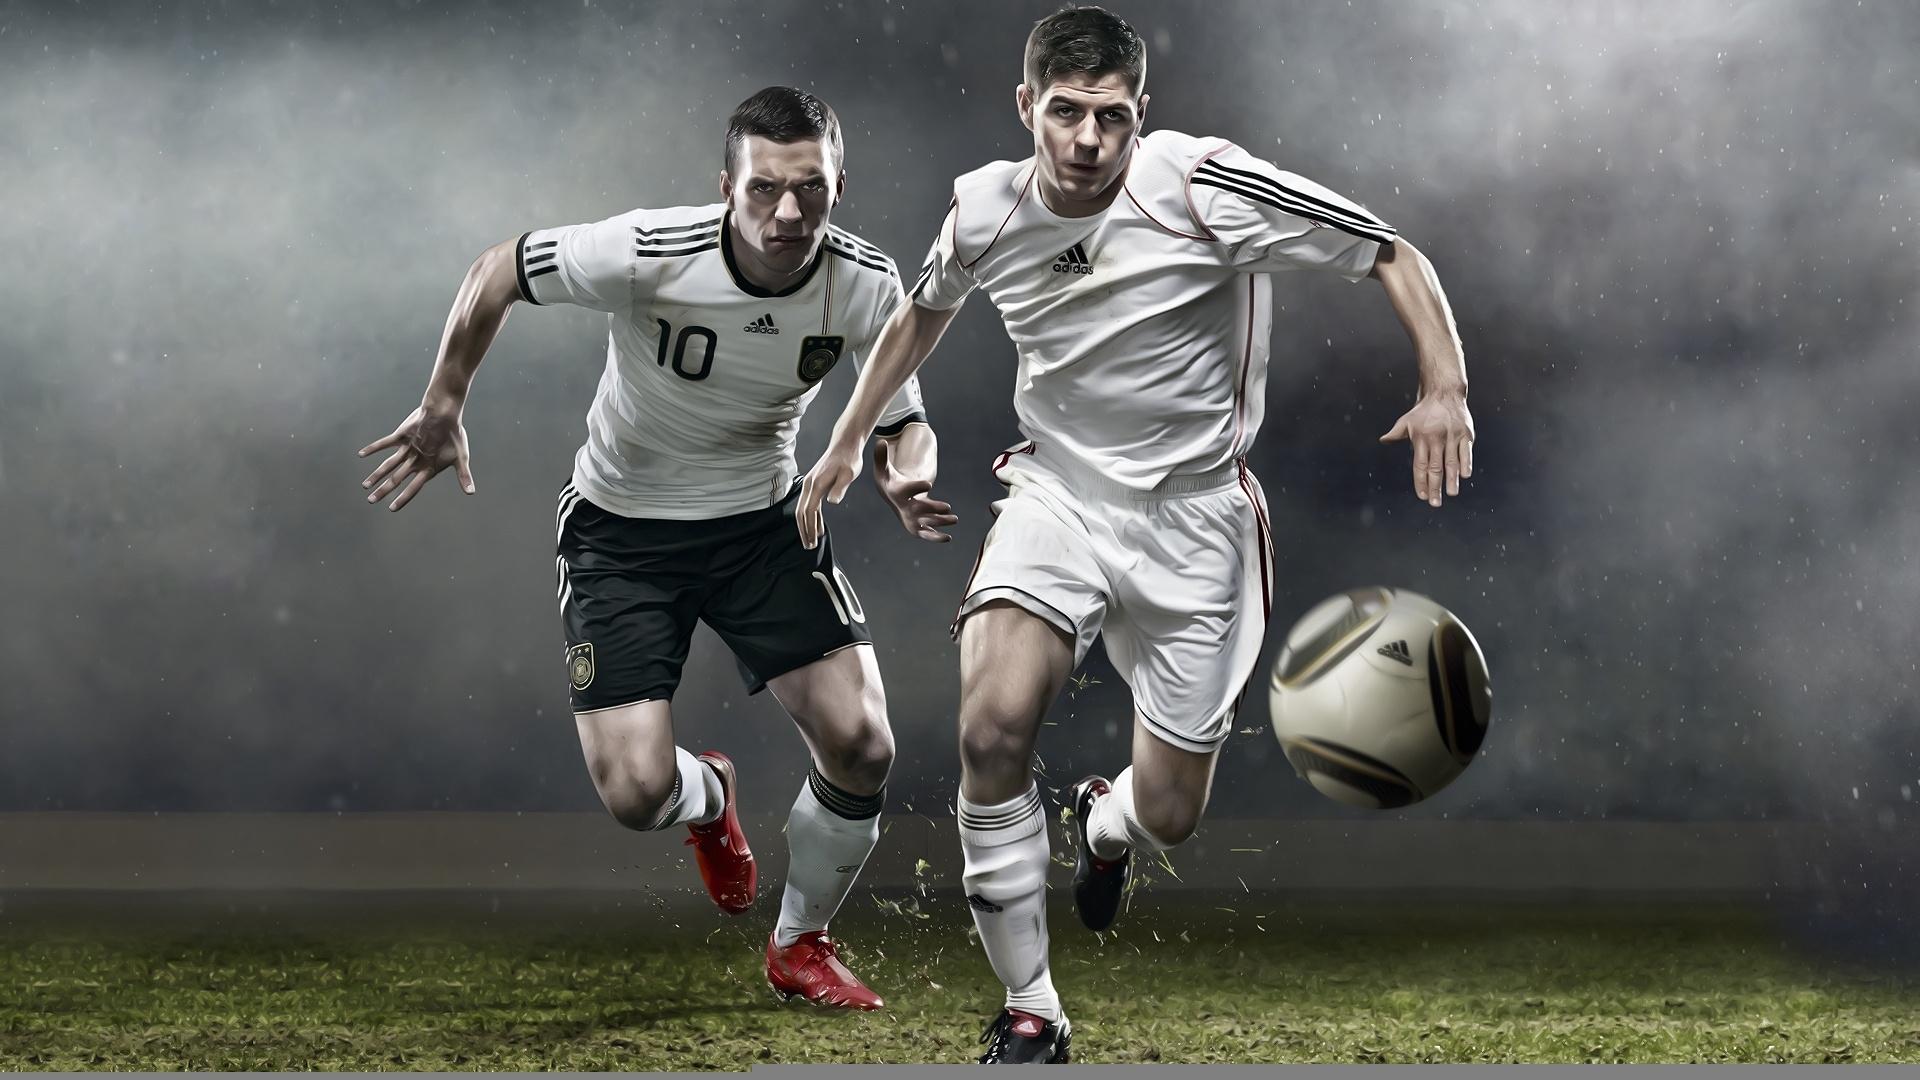 Hintergrundbilder Manner Sport Gras Fotografie Fussball